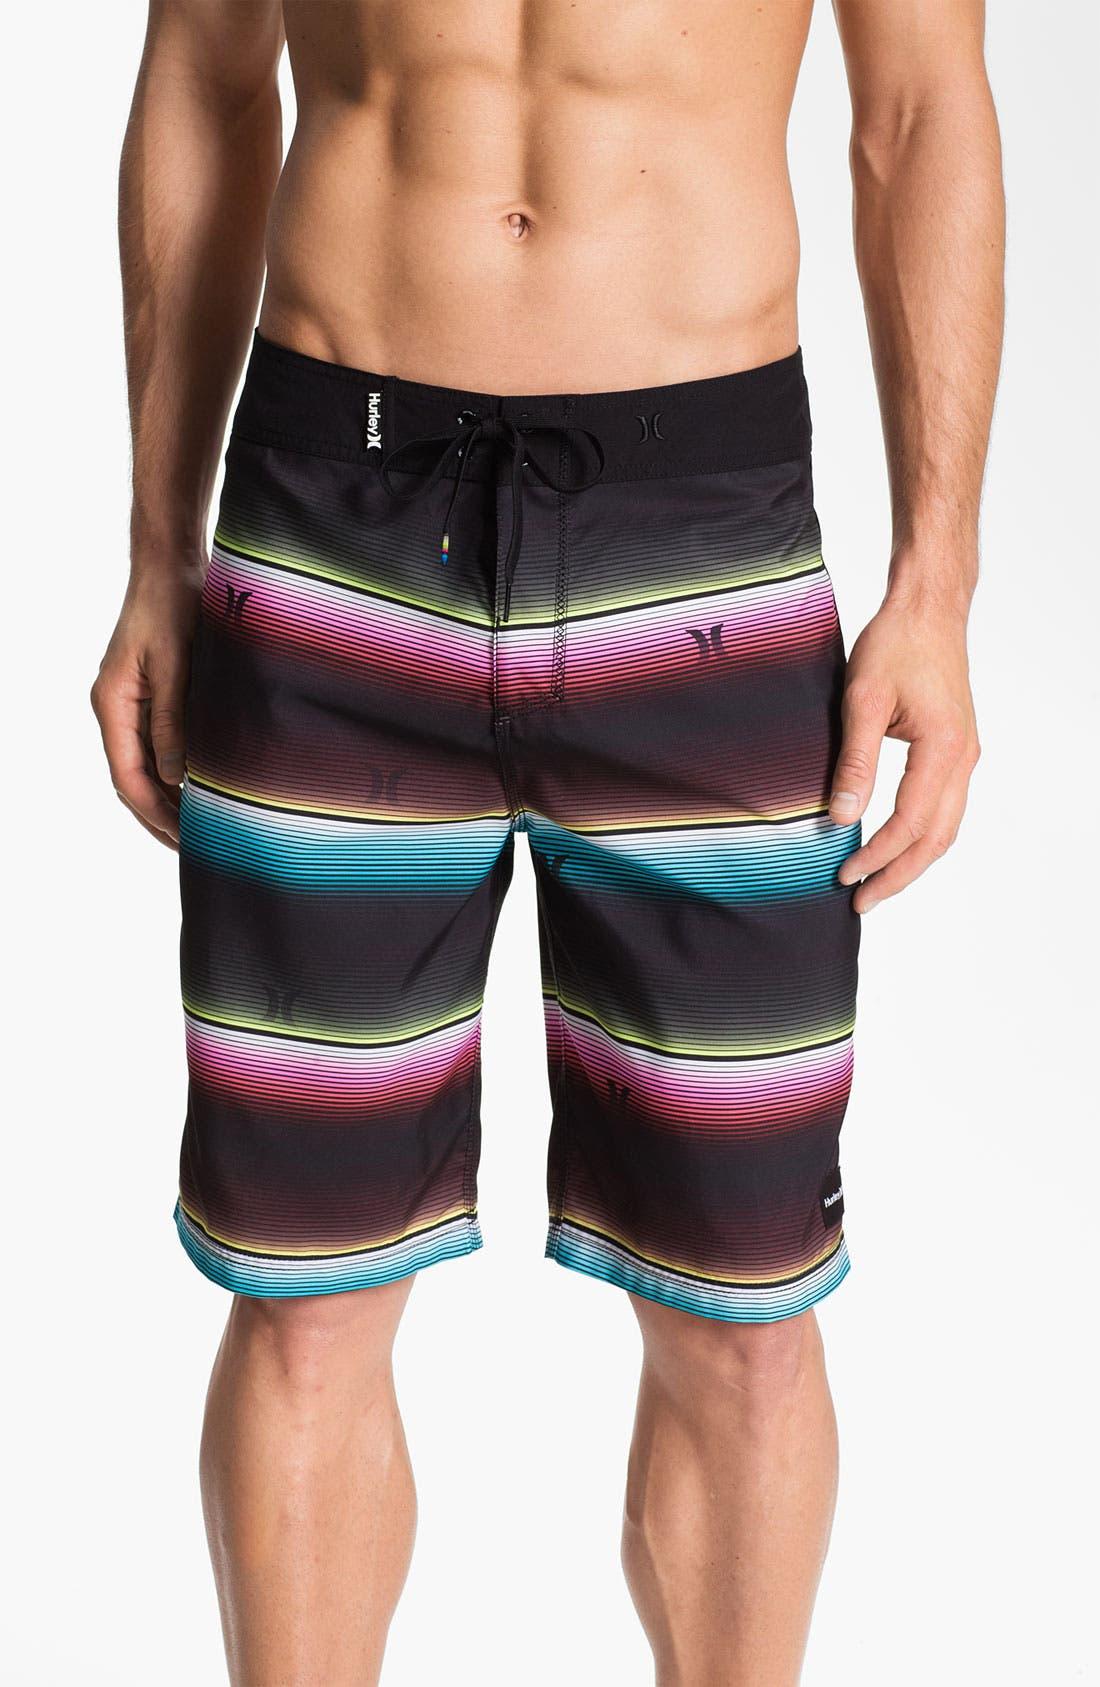 Alternate Image 1 Selected - Hurley 'Amigo' Board Shorts